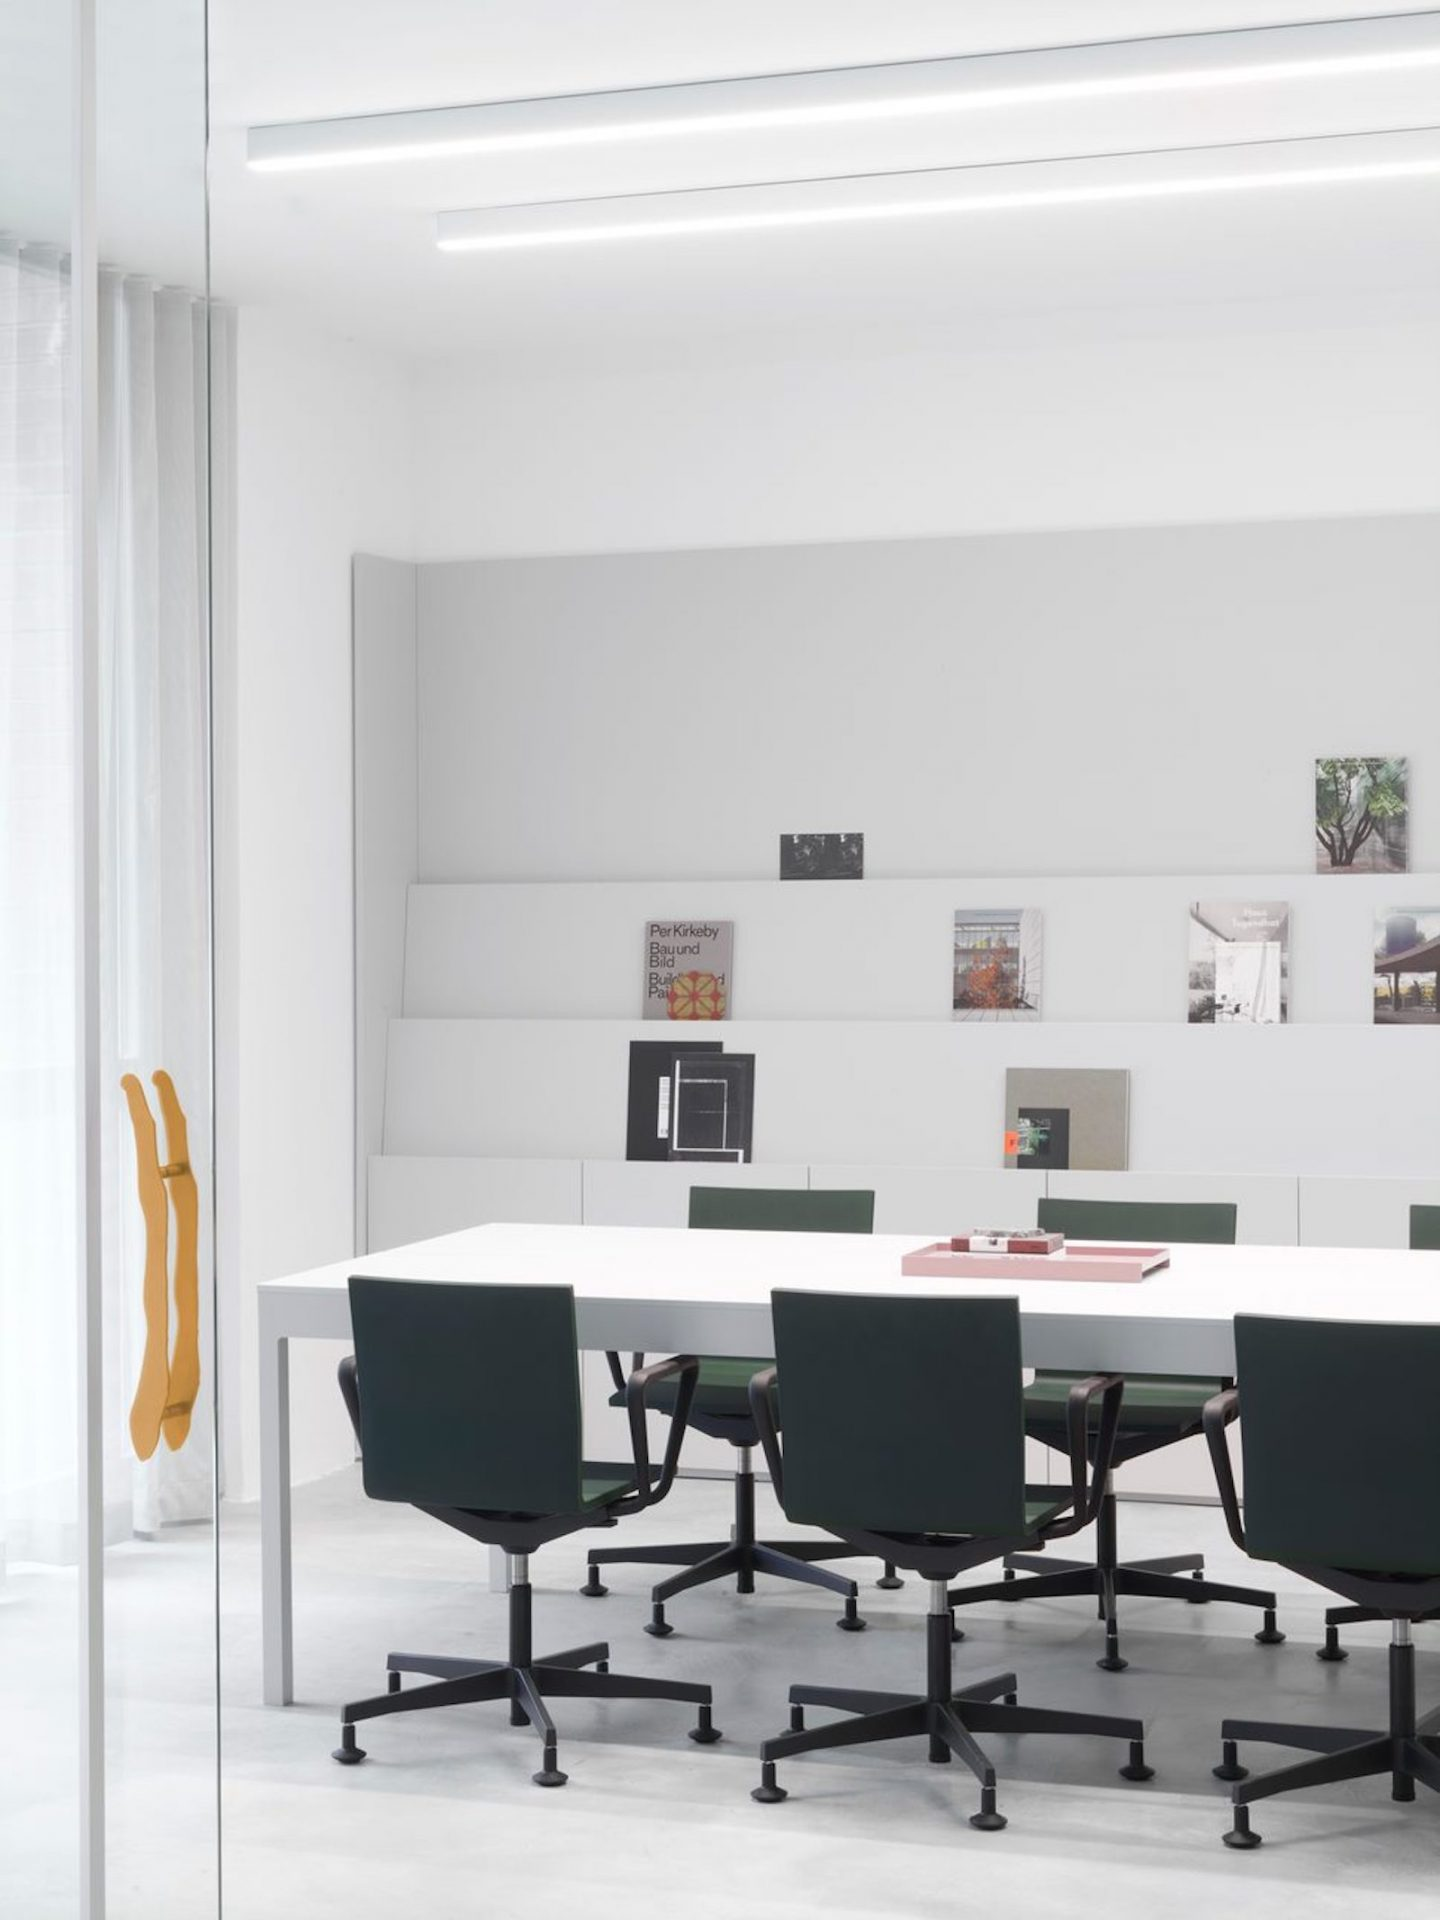 IGNANT-Design-KX-Workshop-Kemmler-010